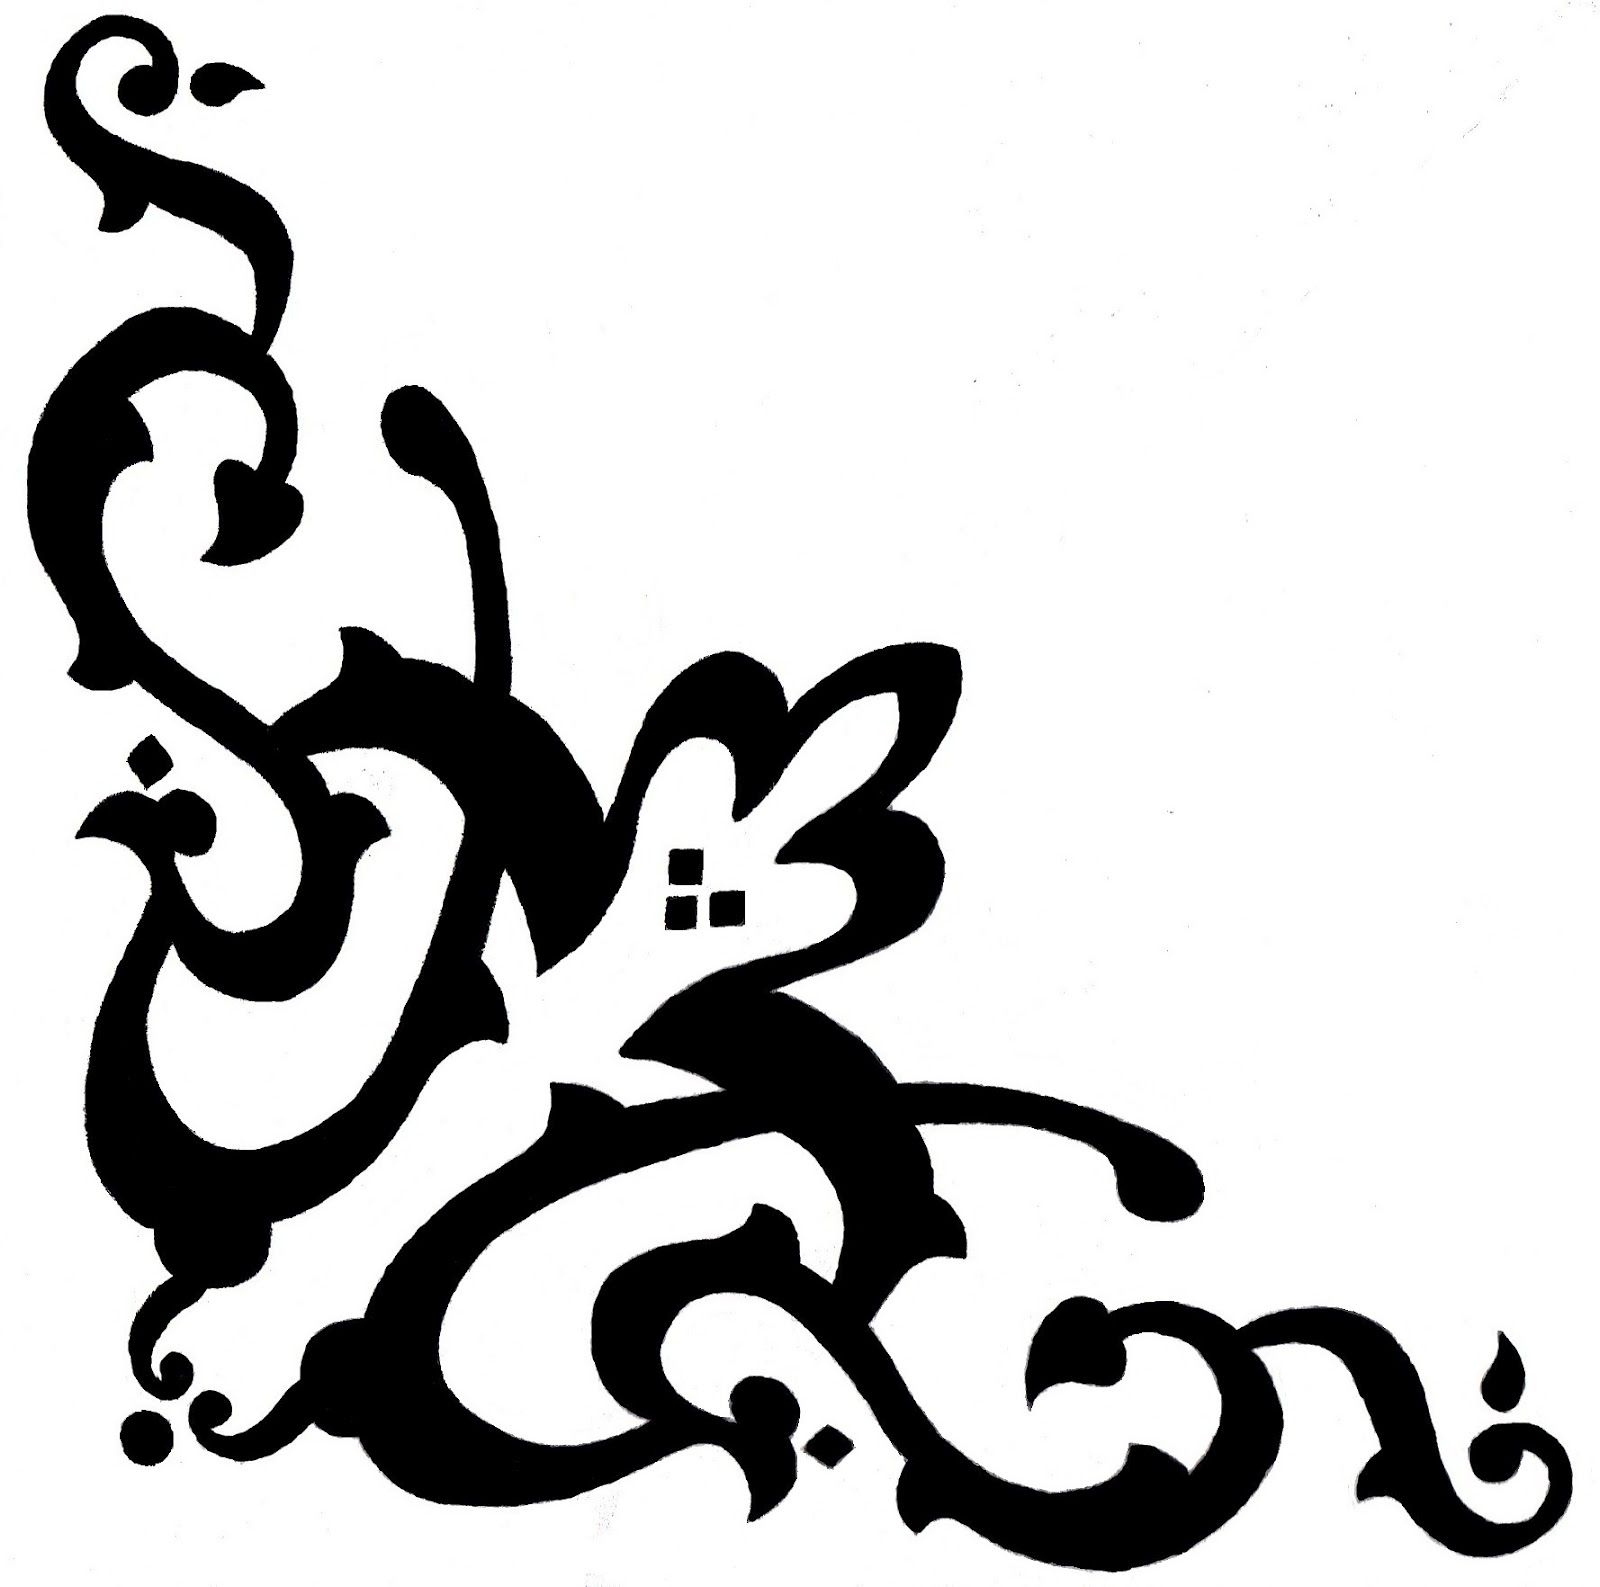 Contoh Ornamen Bentuk Menyudut Simetris Motif Tumbuhan Ornamen Bunga Foto Lucu